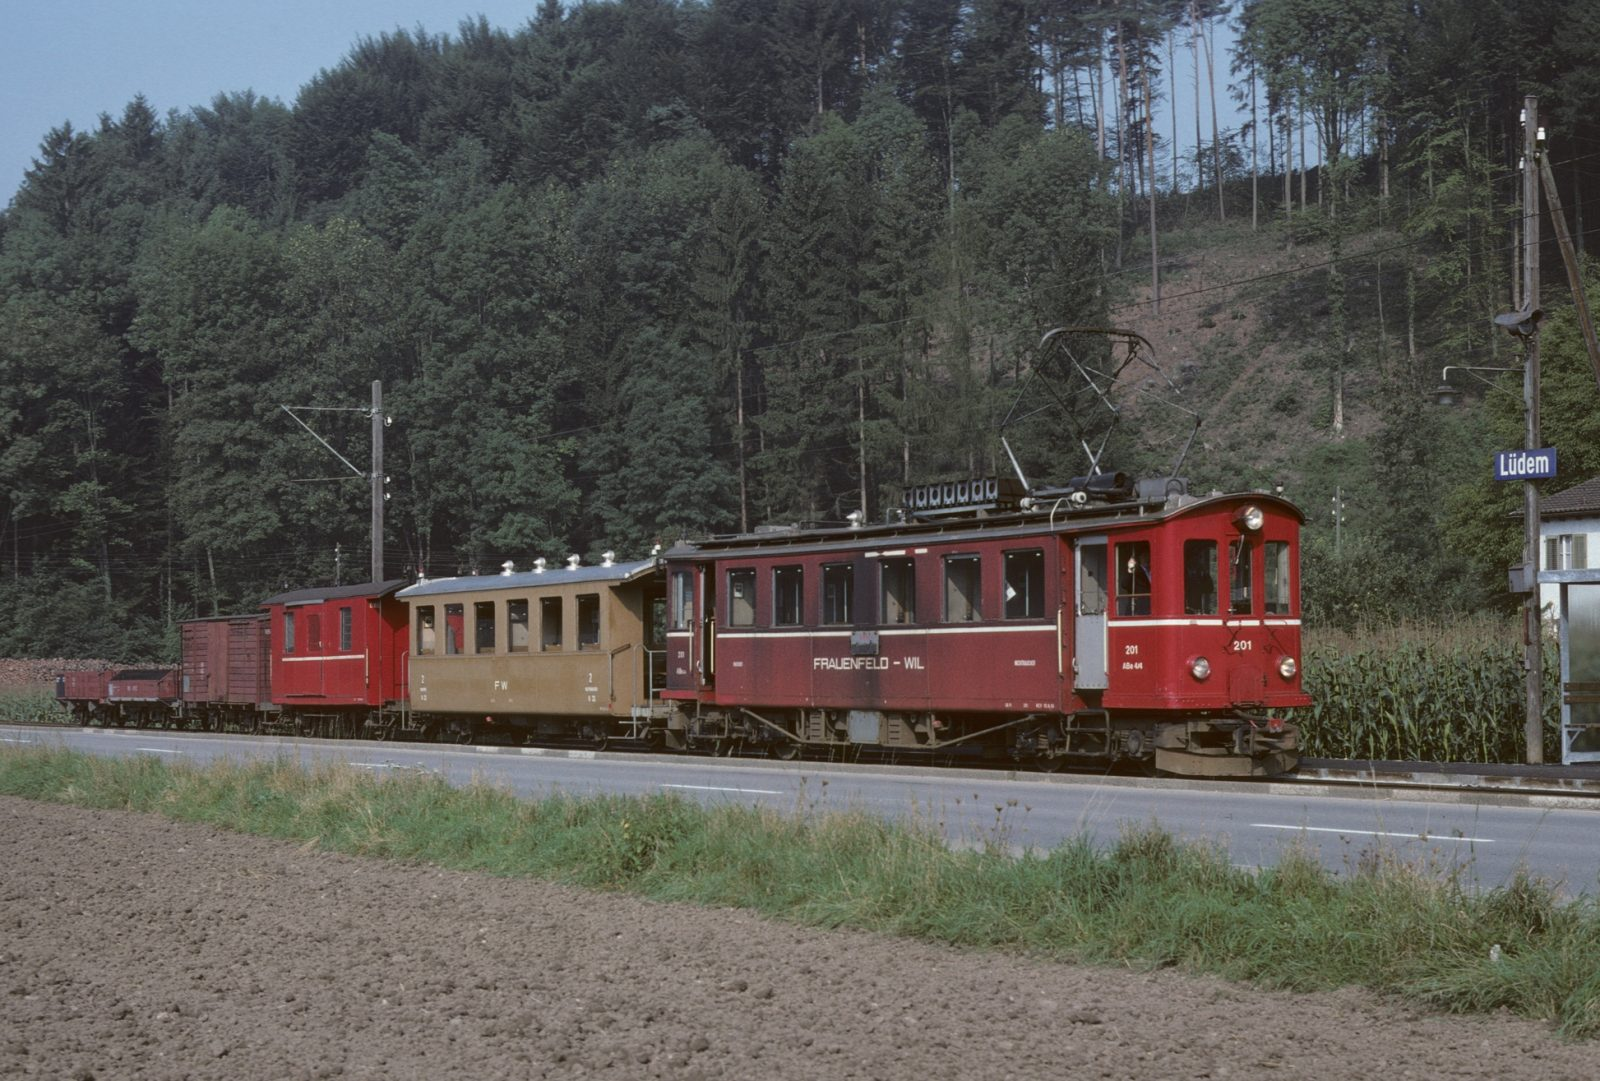 Frauenfeld Wil Bahn lüdem